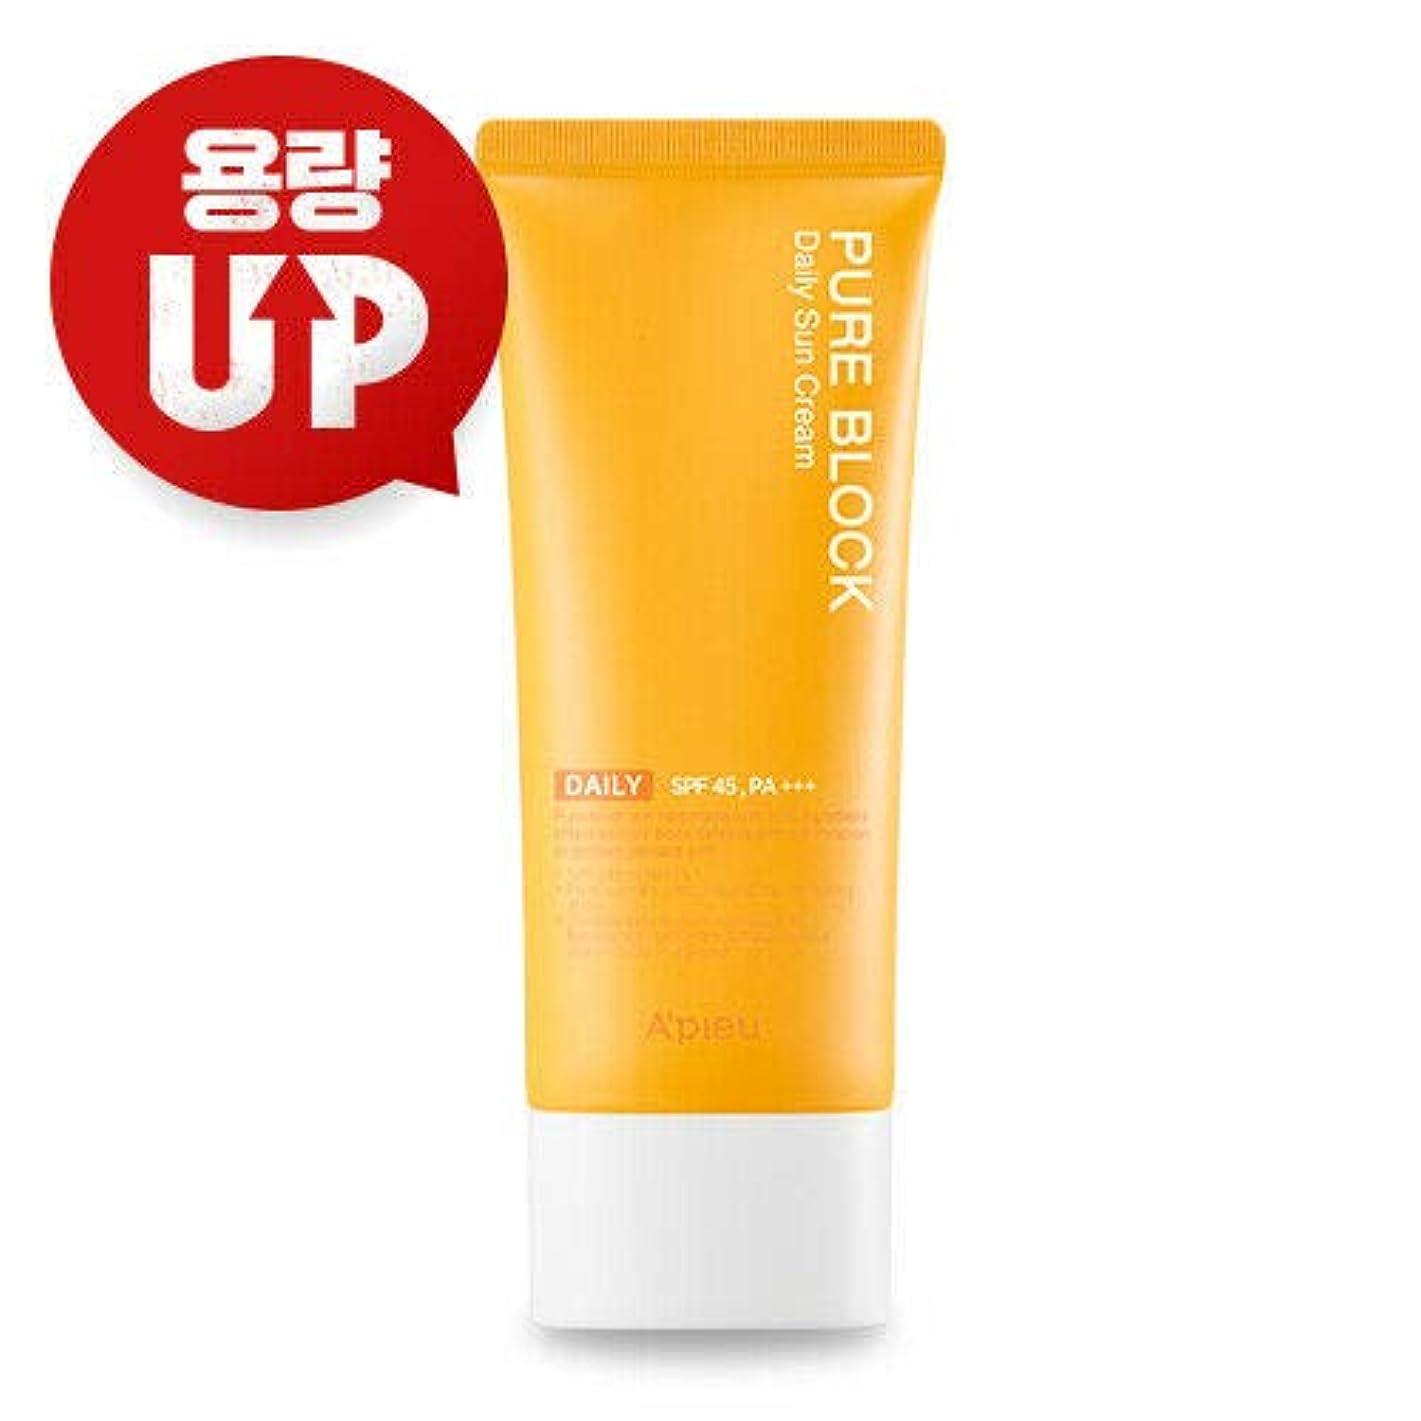 A'PIEU オピュ ピュアブロックナチュラル サンクリーム APIEU PURE BLOCK Natural Sun Cream 100ml SPF45/PA+++